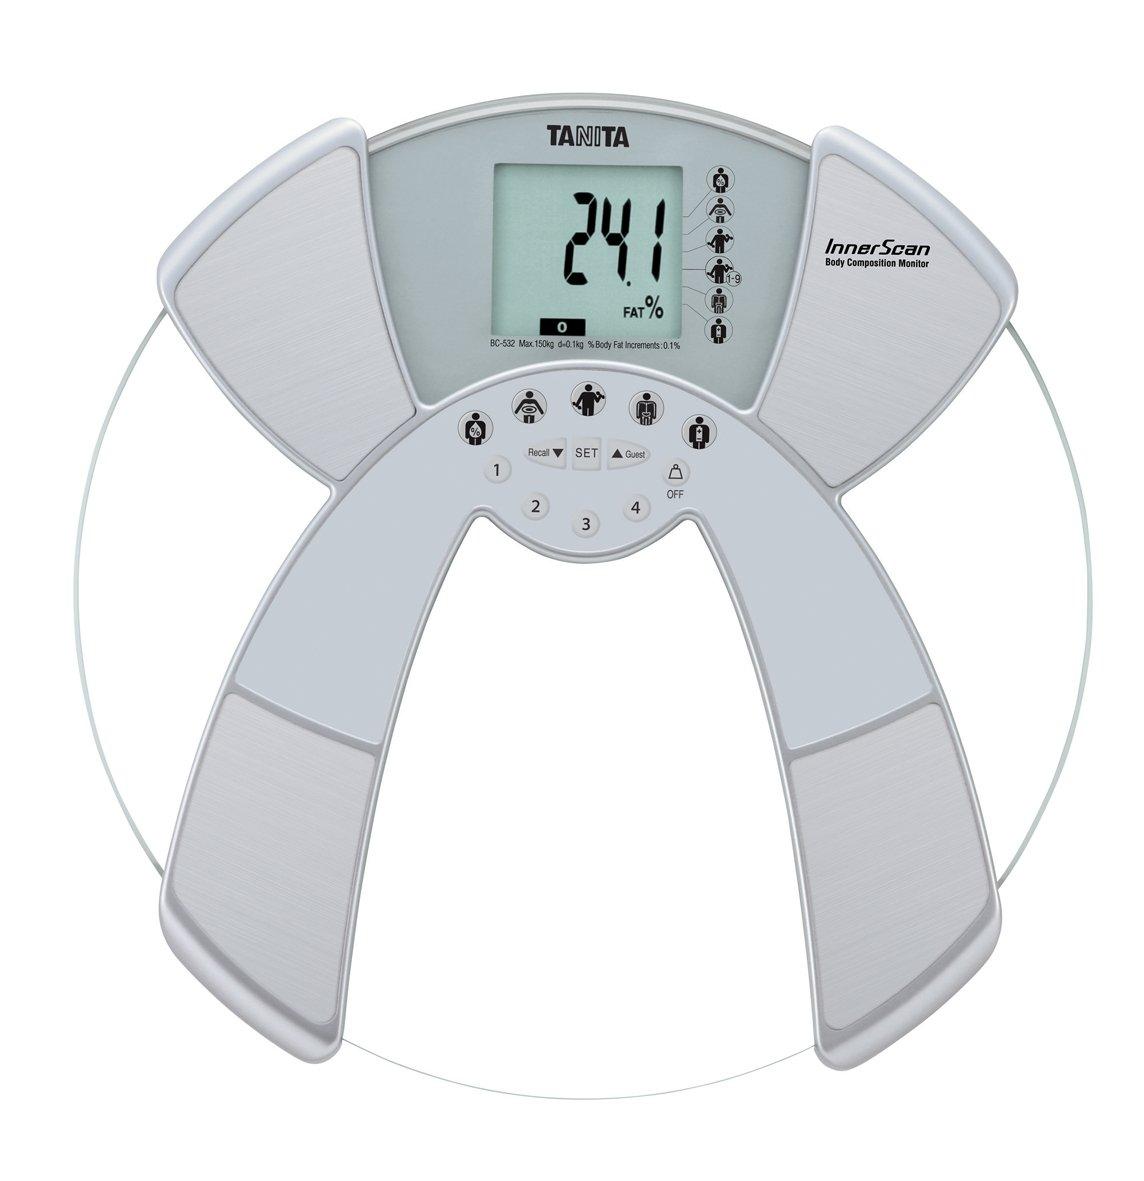 (TANITA) InnerScan Body Composition Monitor (BC-532)